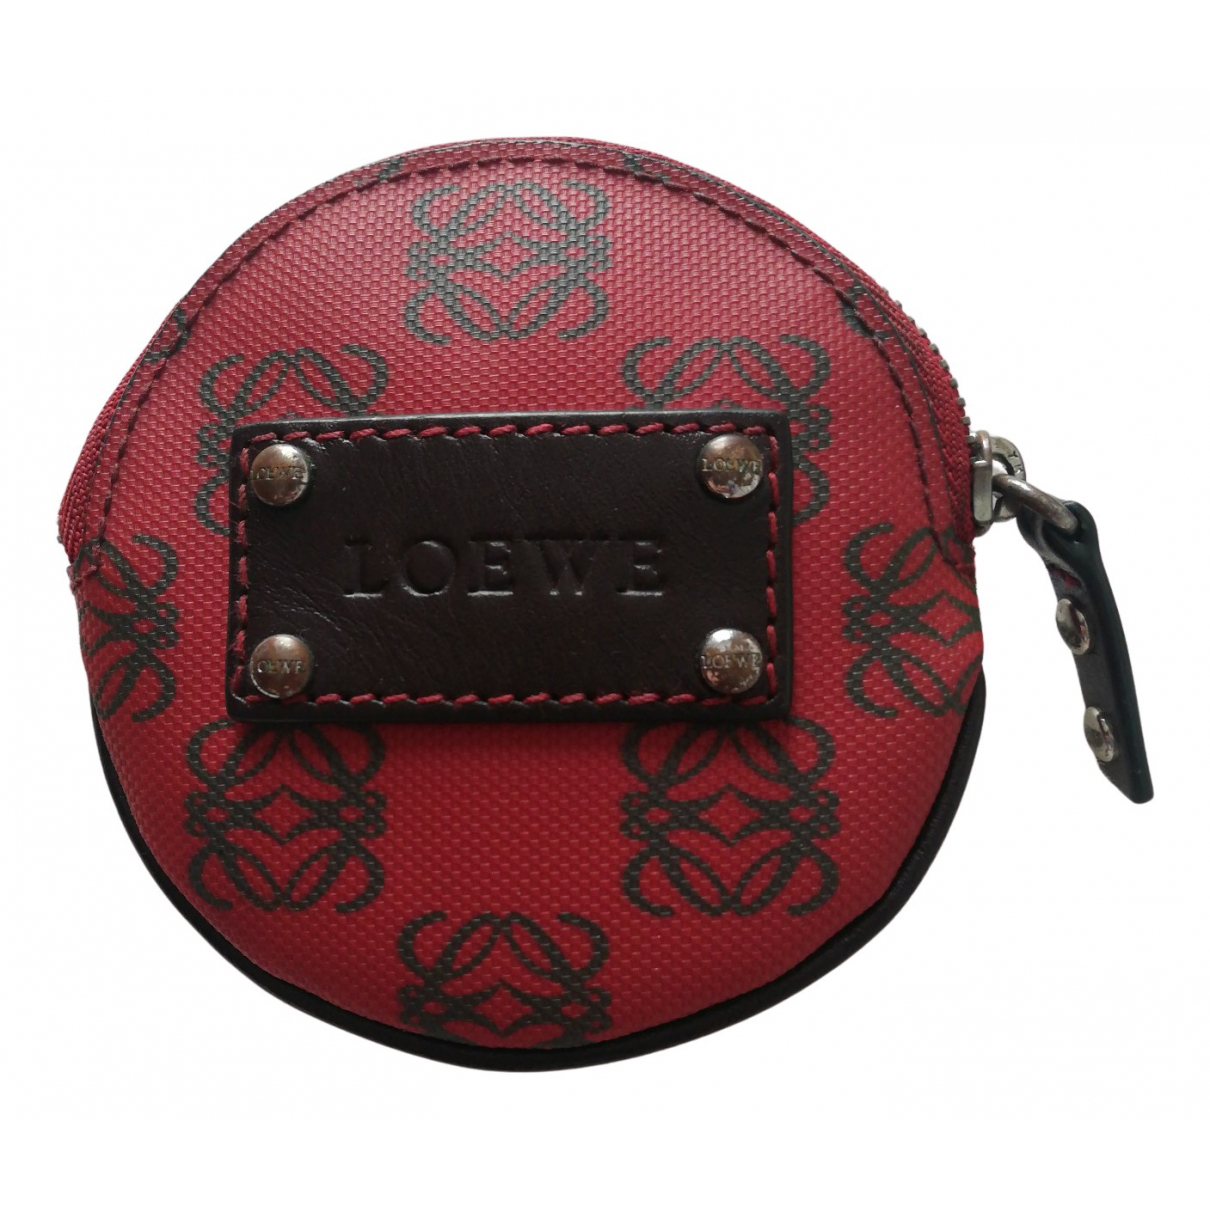 Loewe N Multicolour Cloth Purses, wallet & cases for Women N